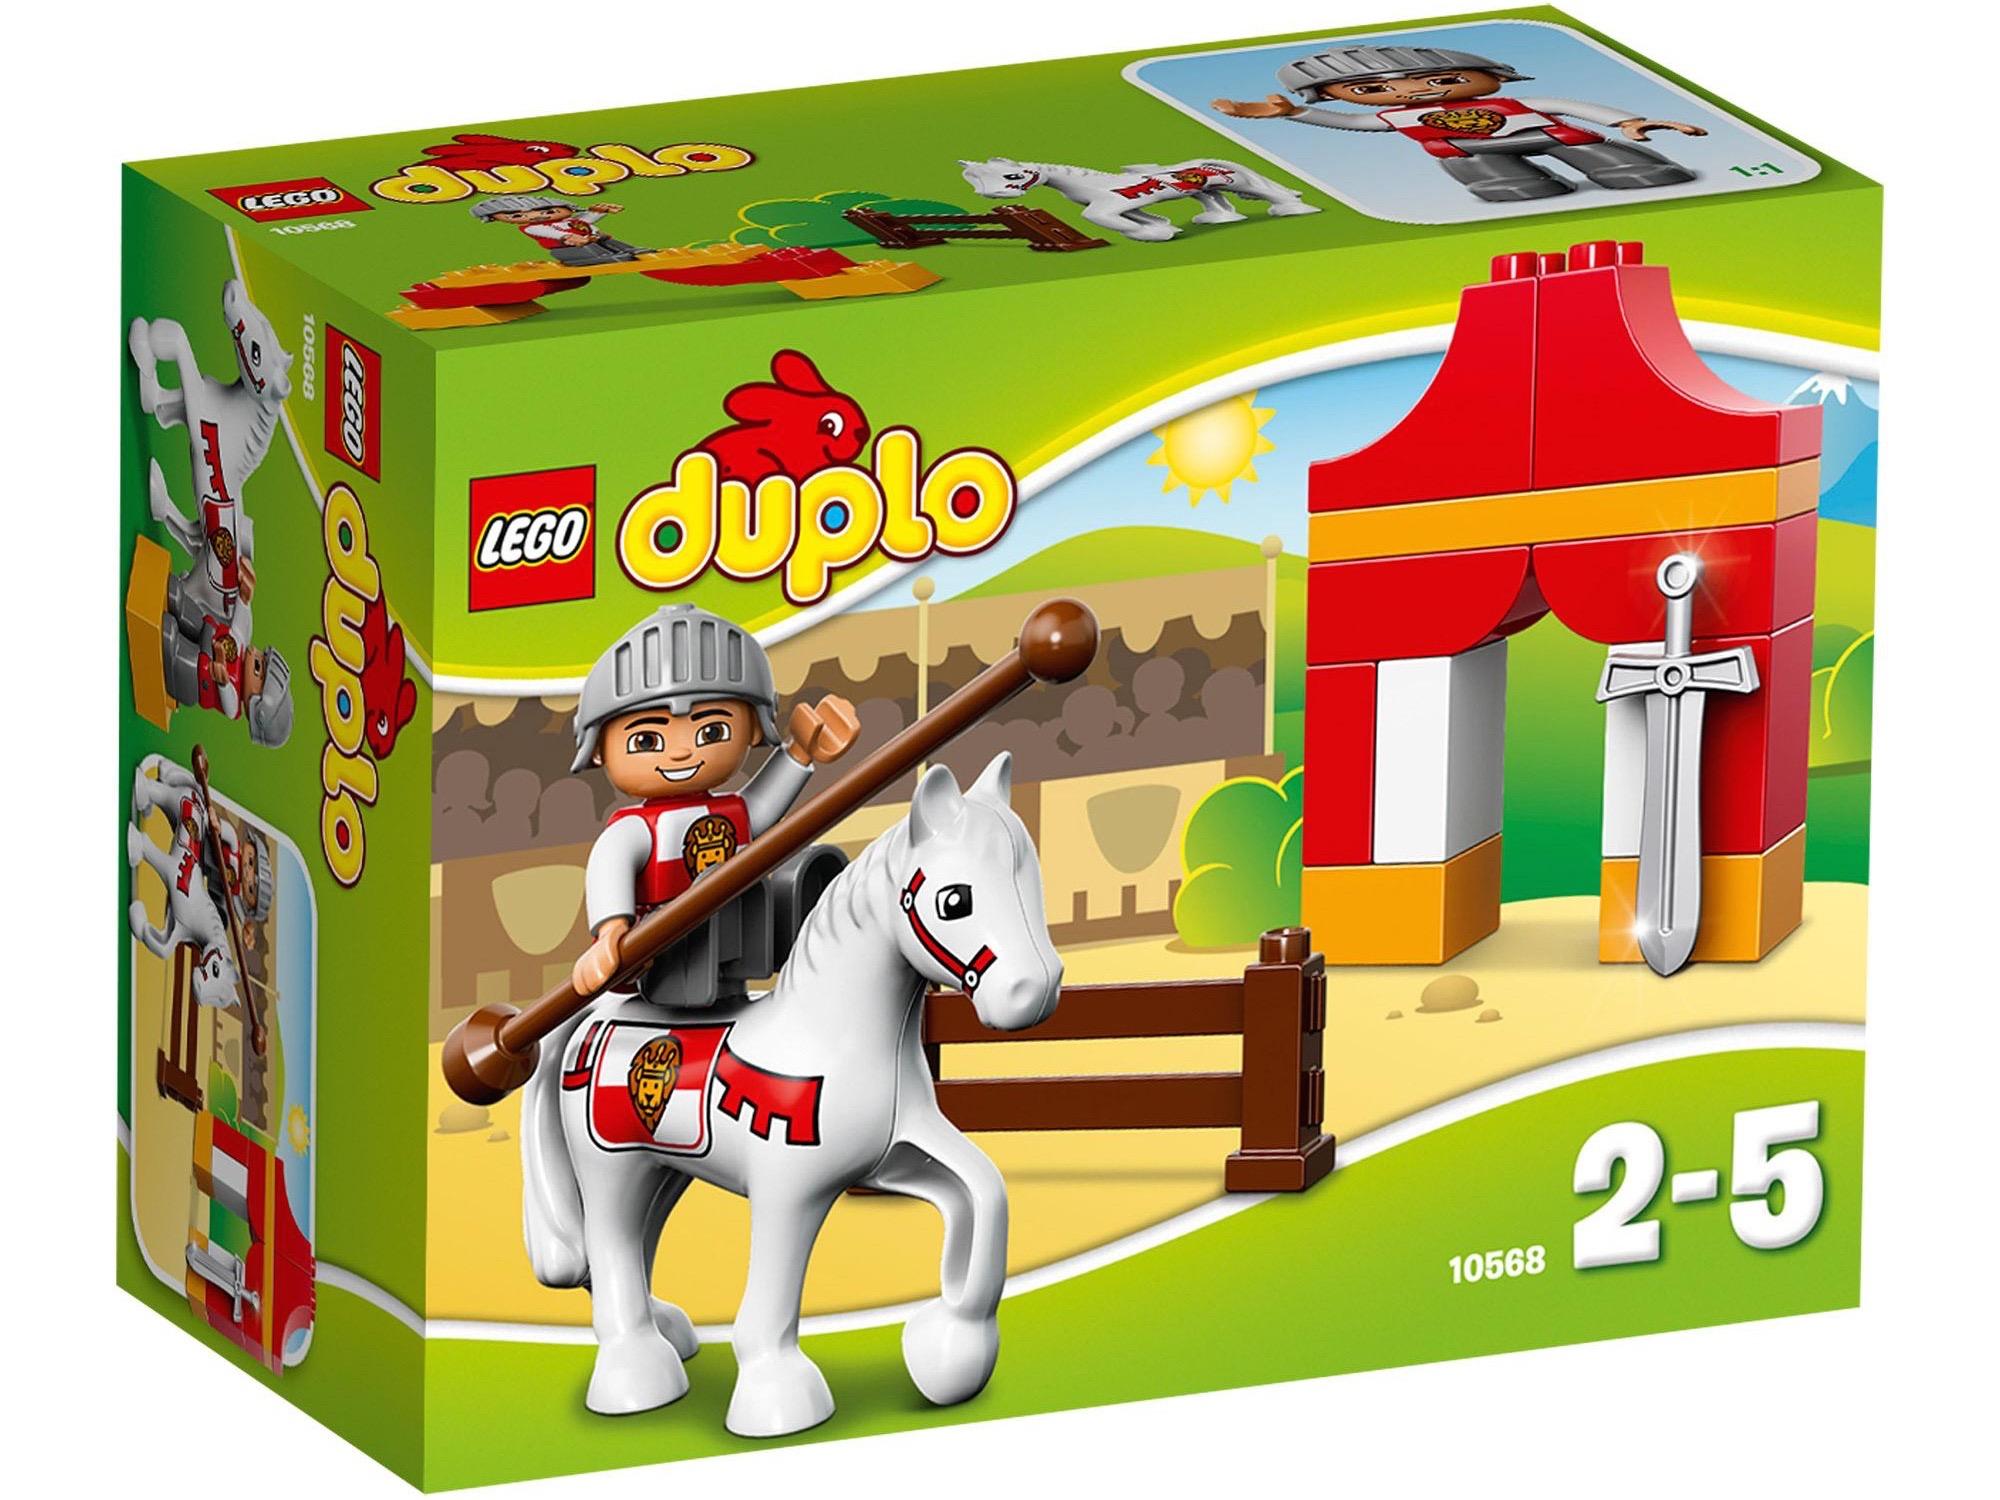 Vỏ hốp ản phẩm Lego Duplo 10568 - Kỵ Sĩ